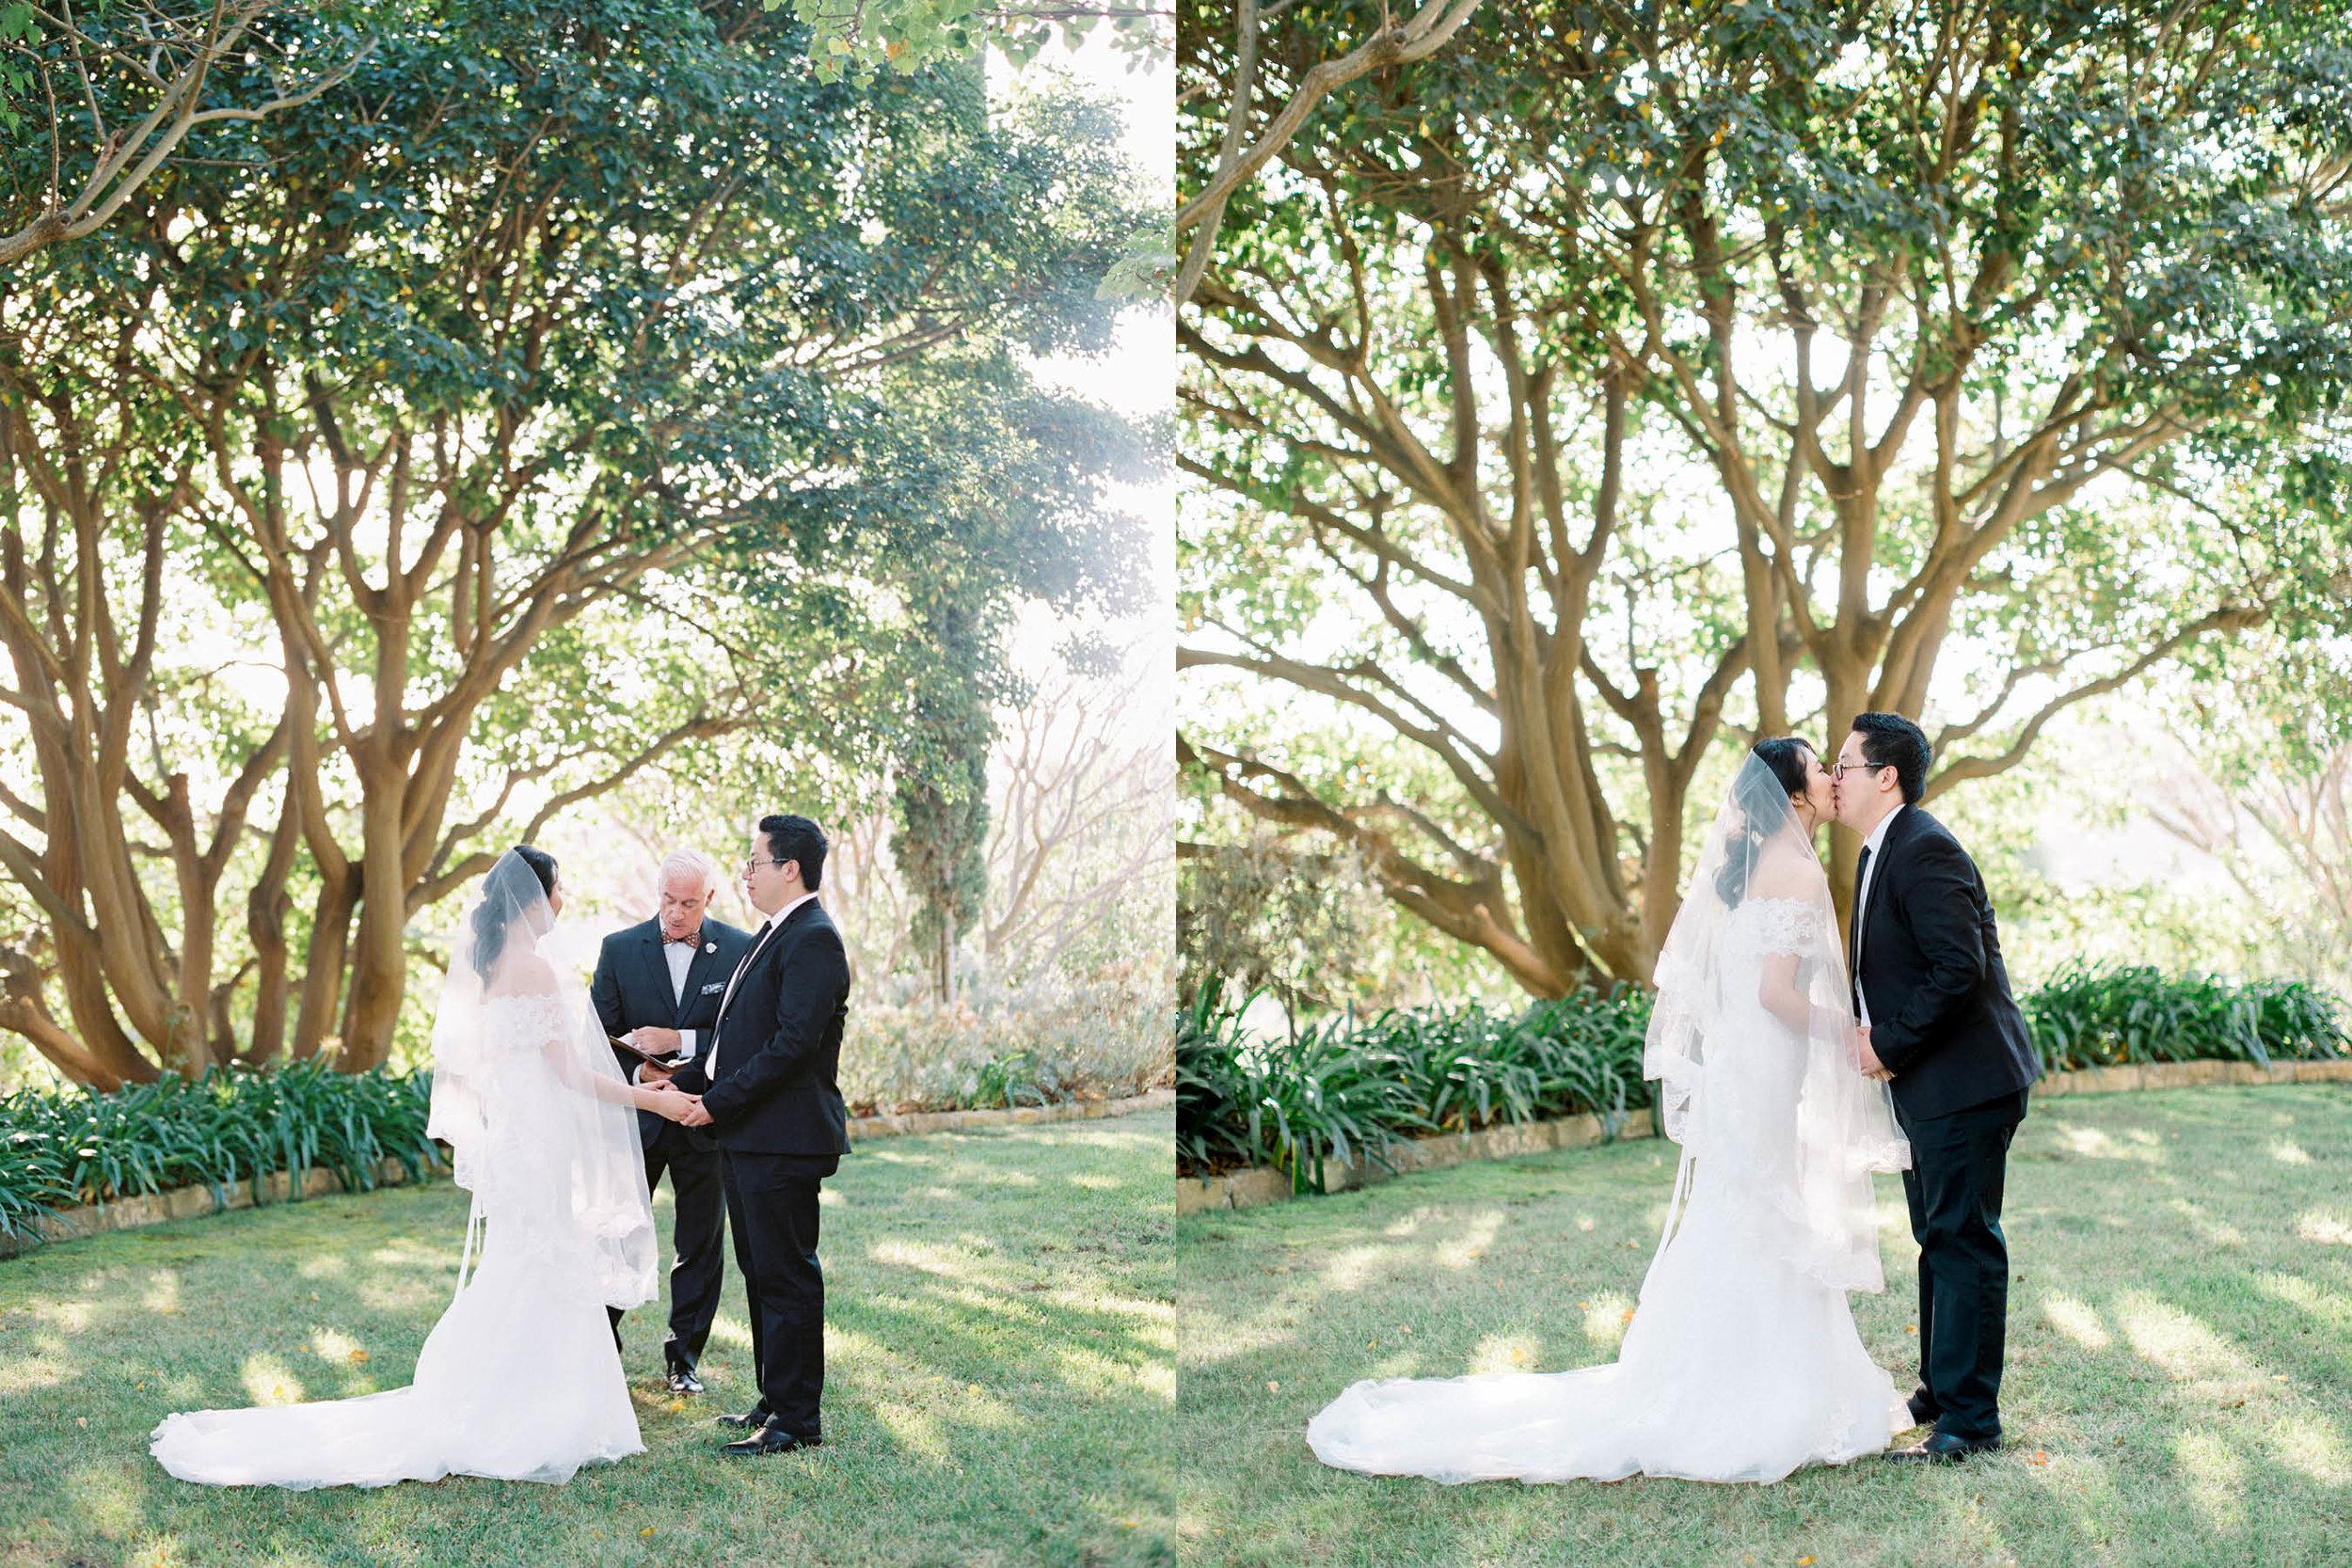 santa-barbara-elopement-wedding-planner-planning-coordinator-coordination-event-design-villa-verano-estate-riviera-garden-olive-tree-asian-day-of-palm-tree (9).jpg